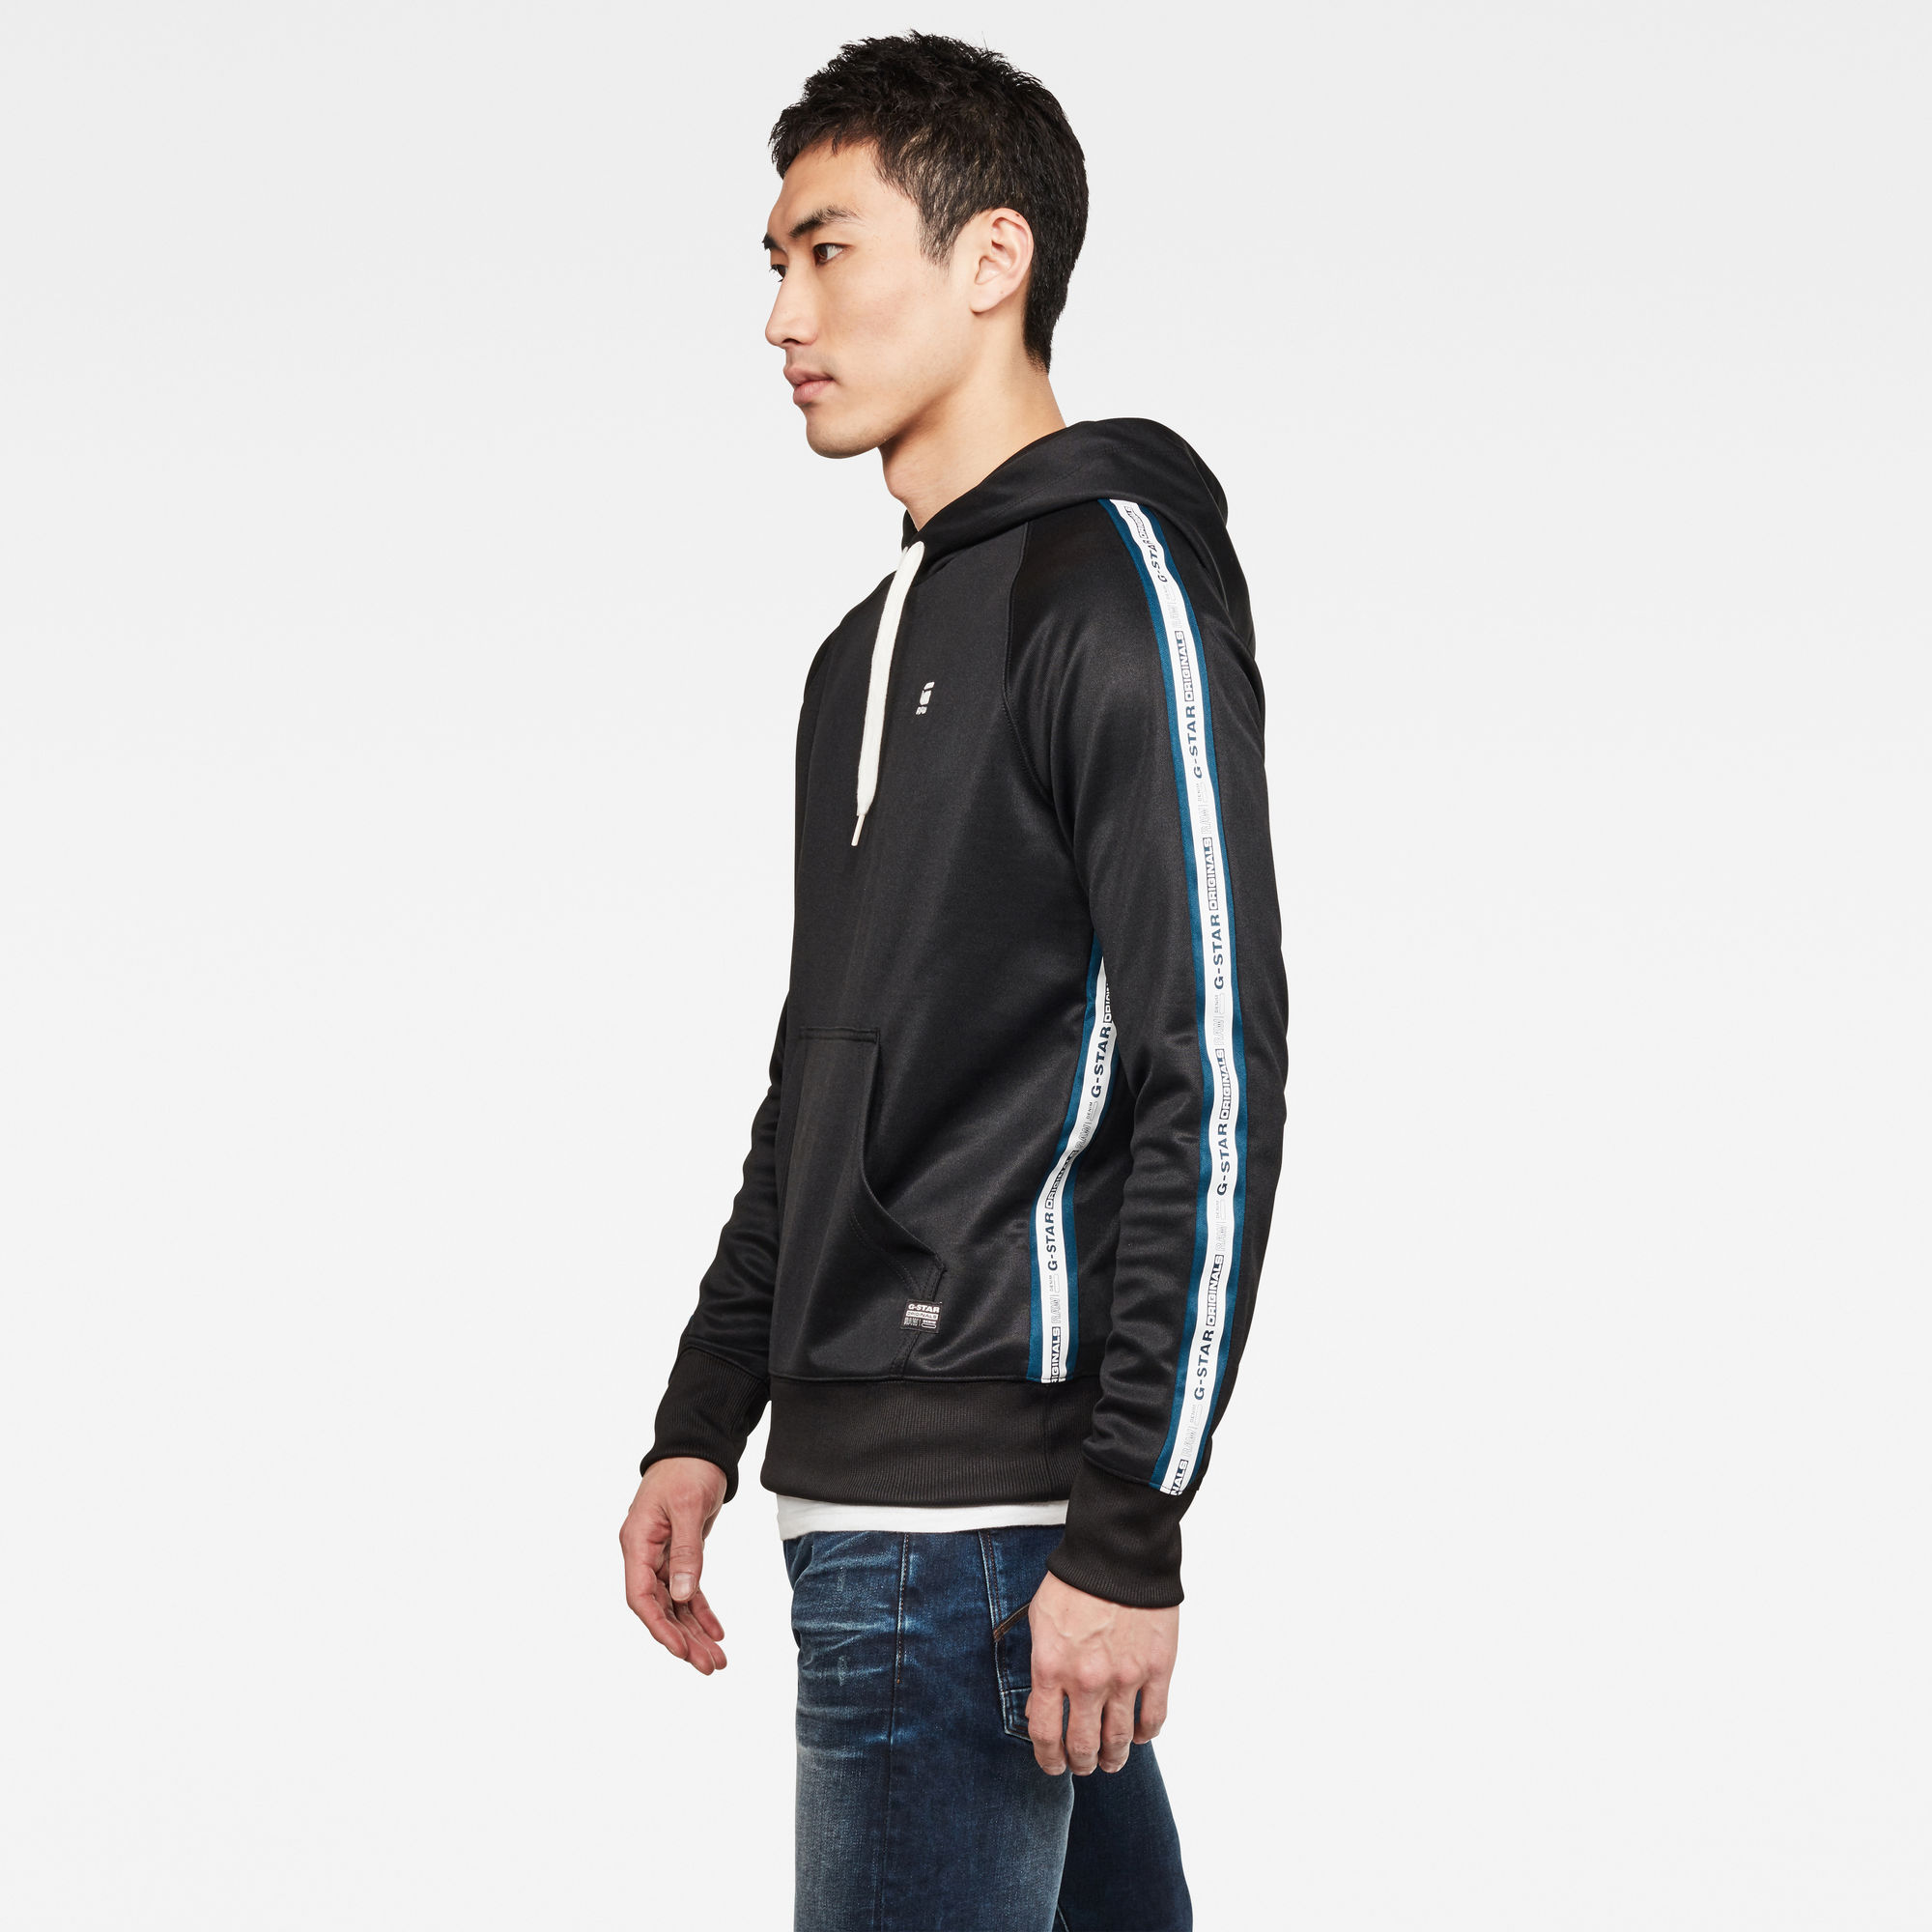 Alchesai or Core Sweater